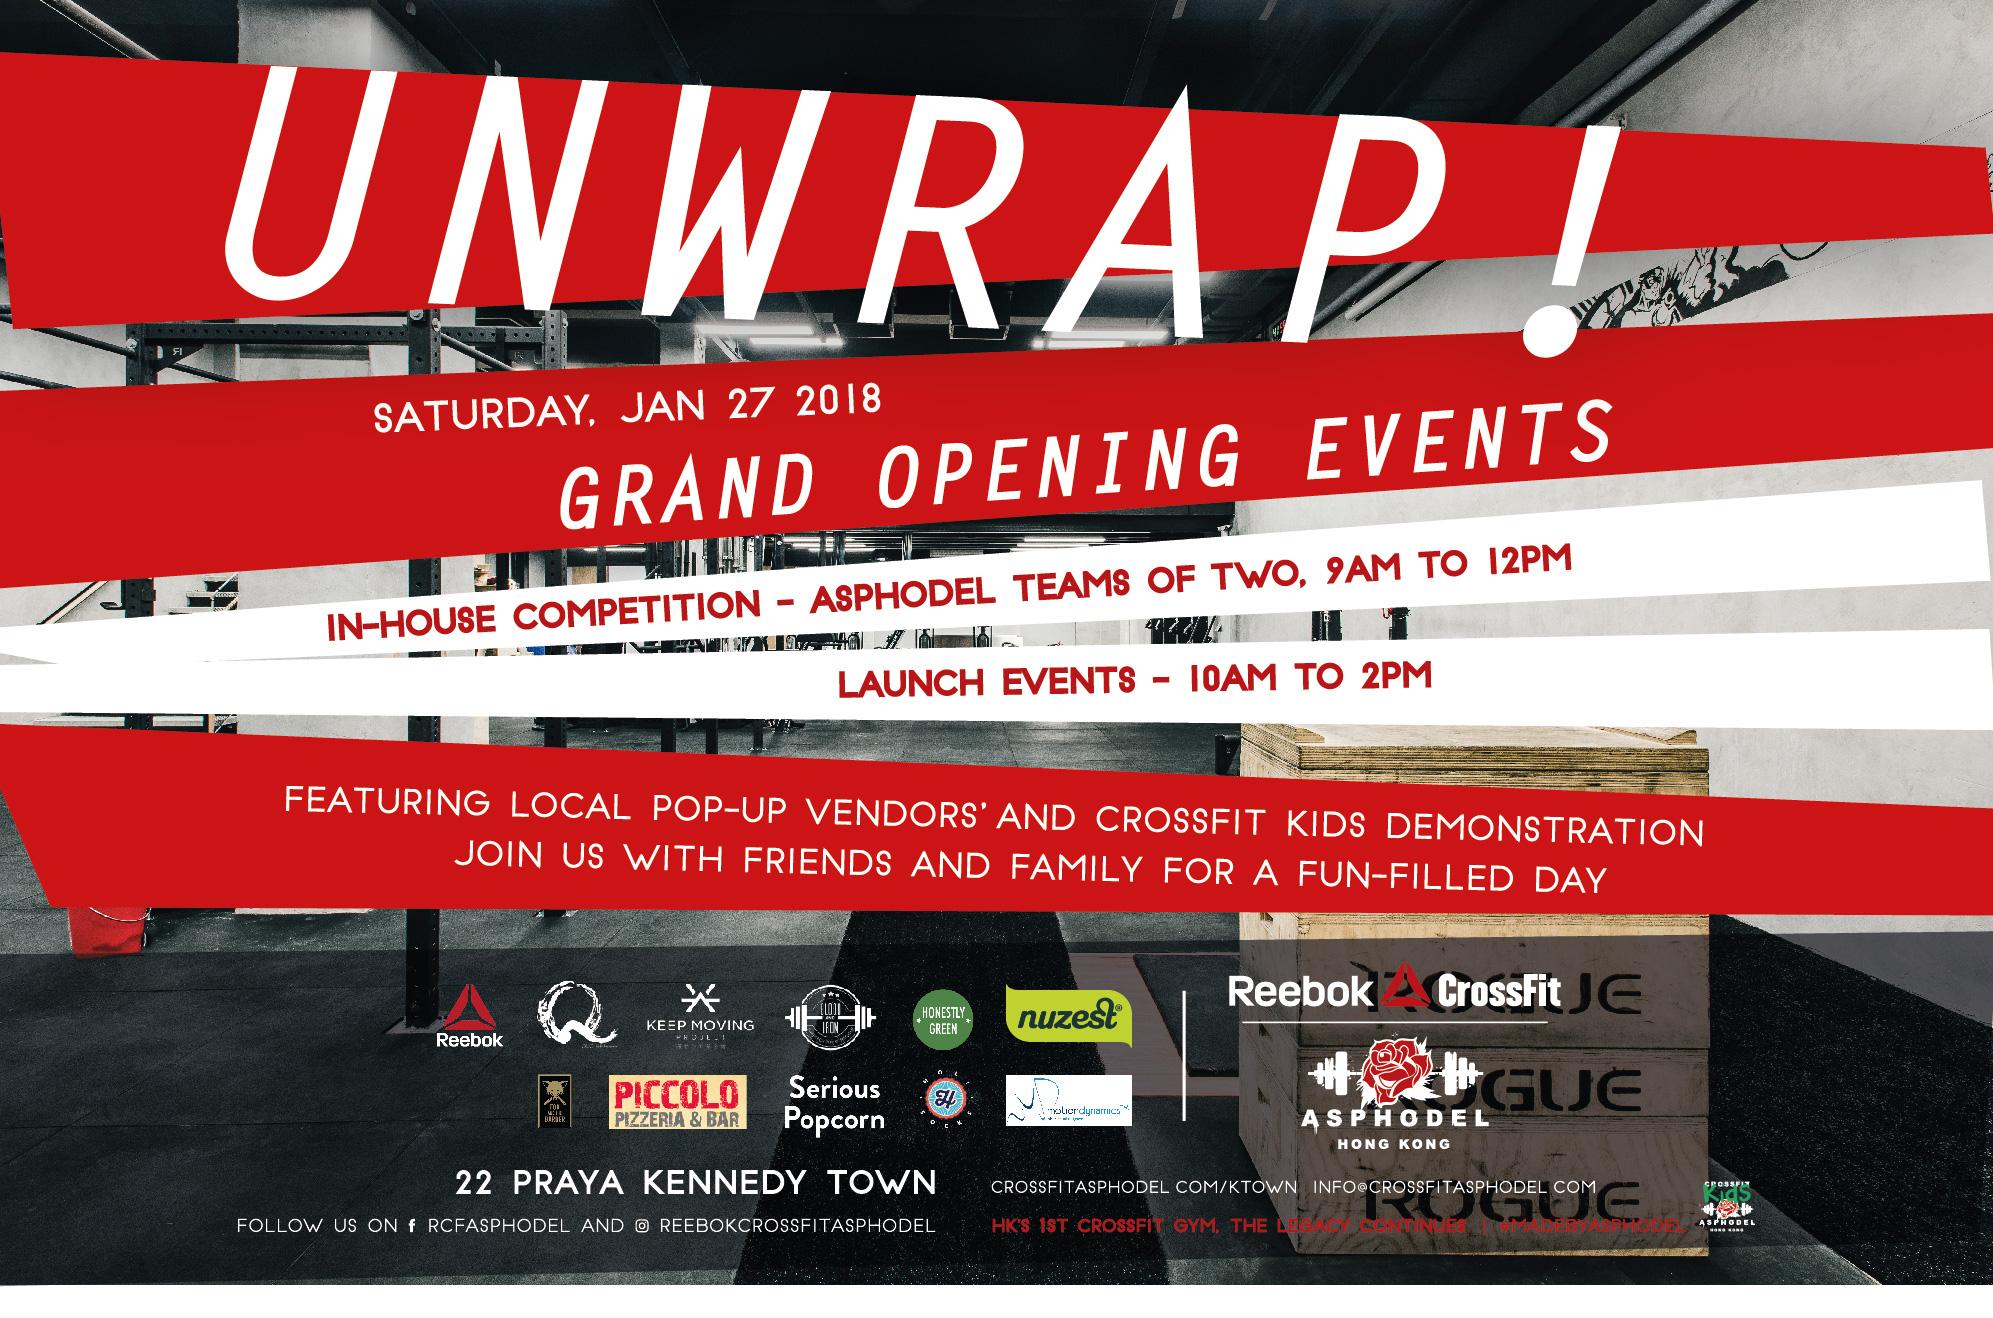 launching-event-postcard-FACEBOOK.jpg